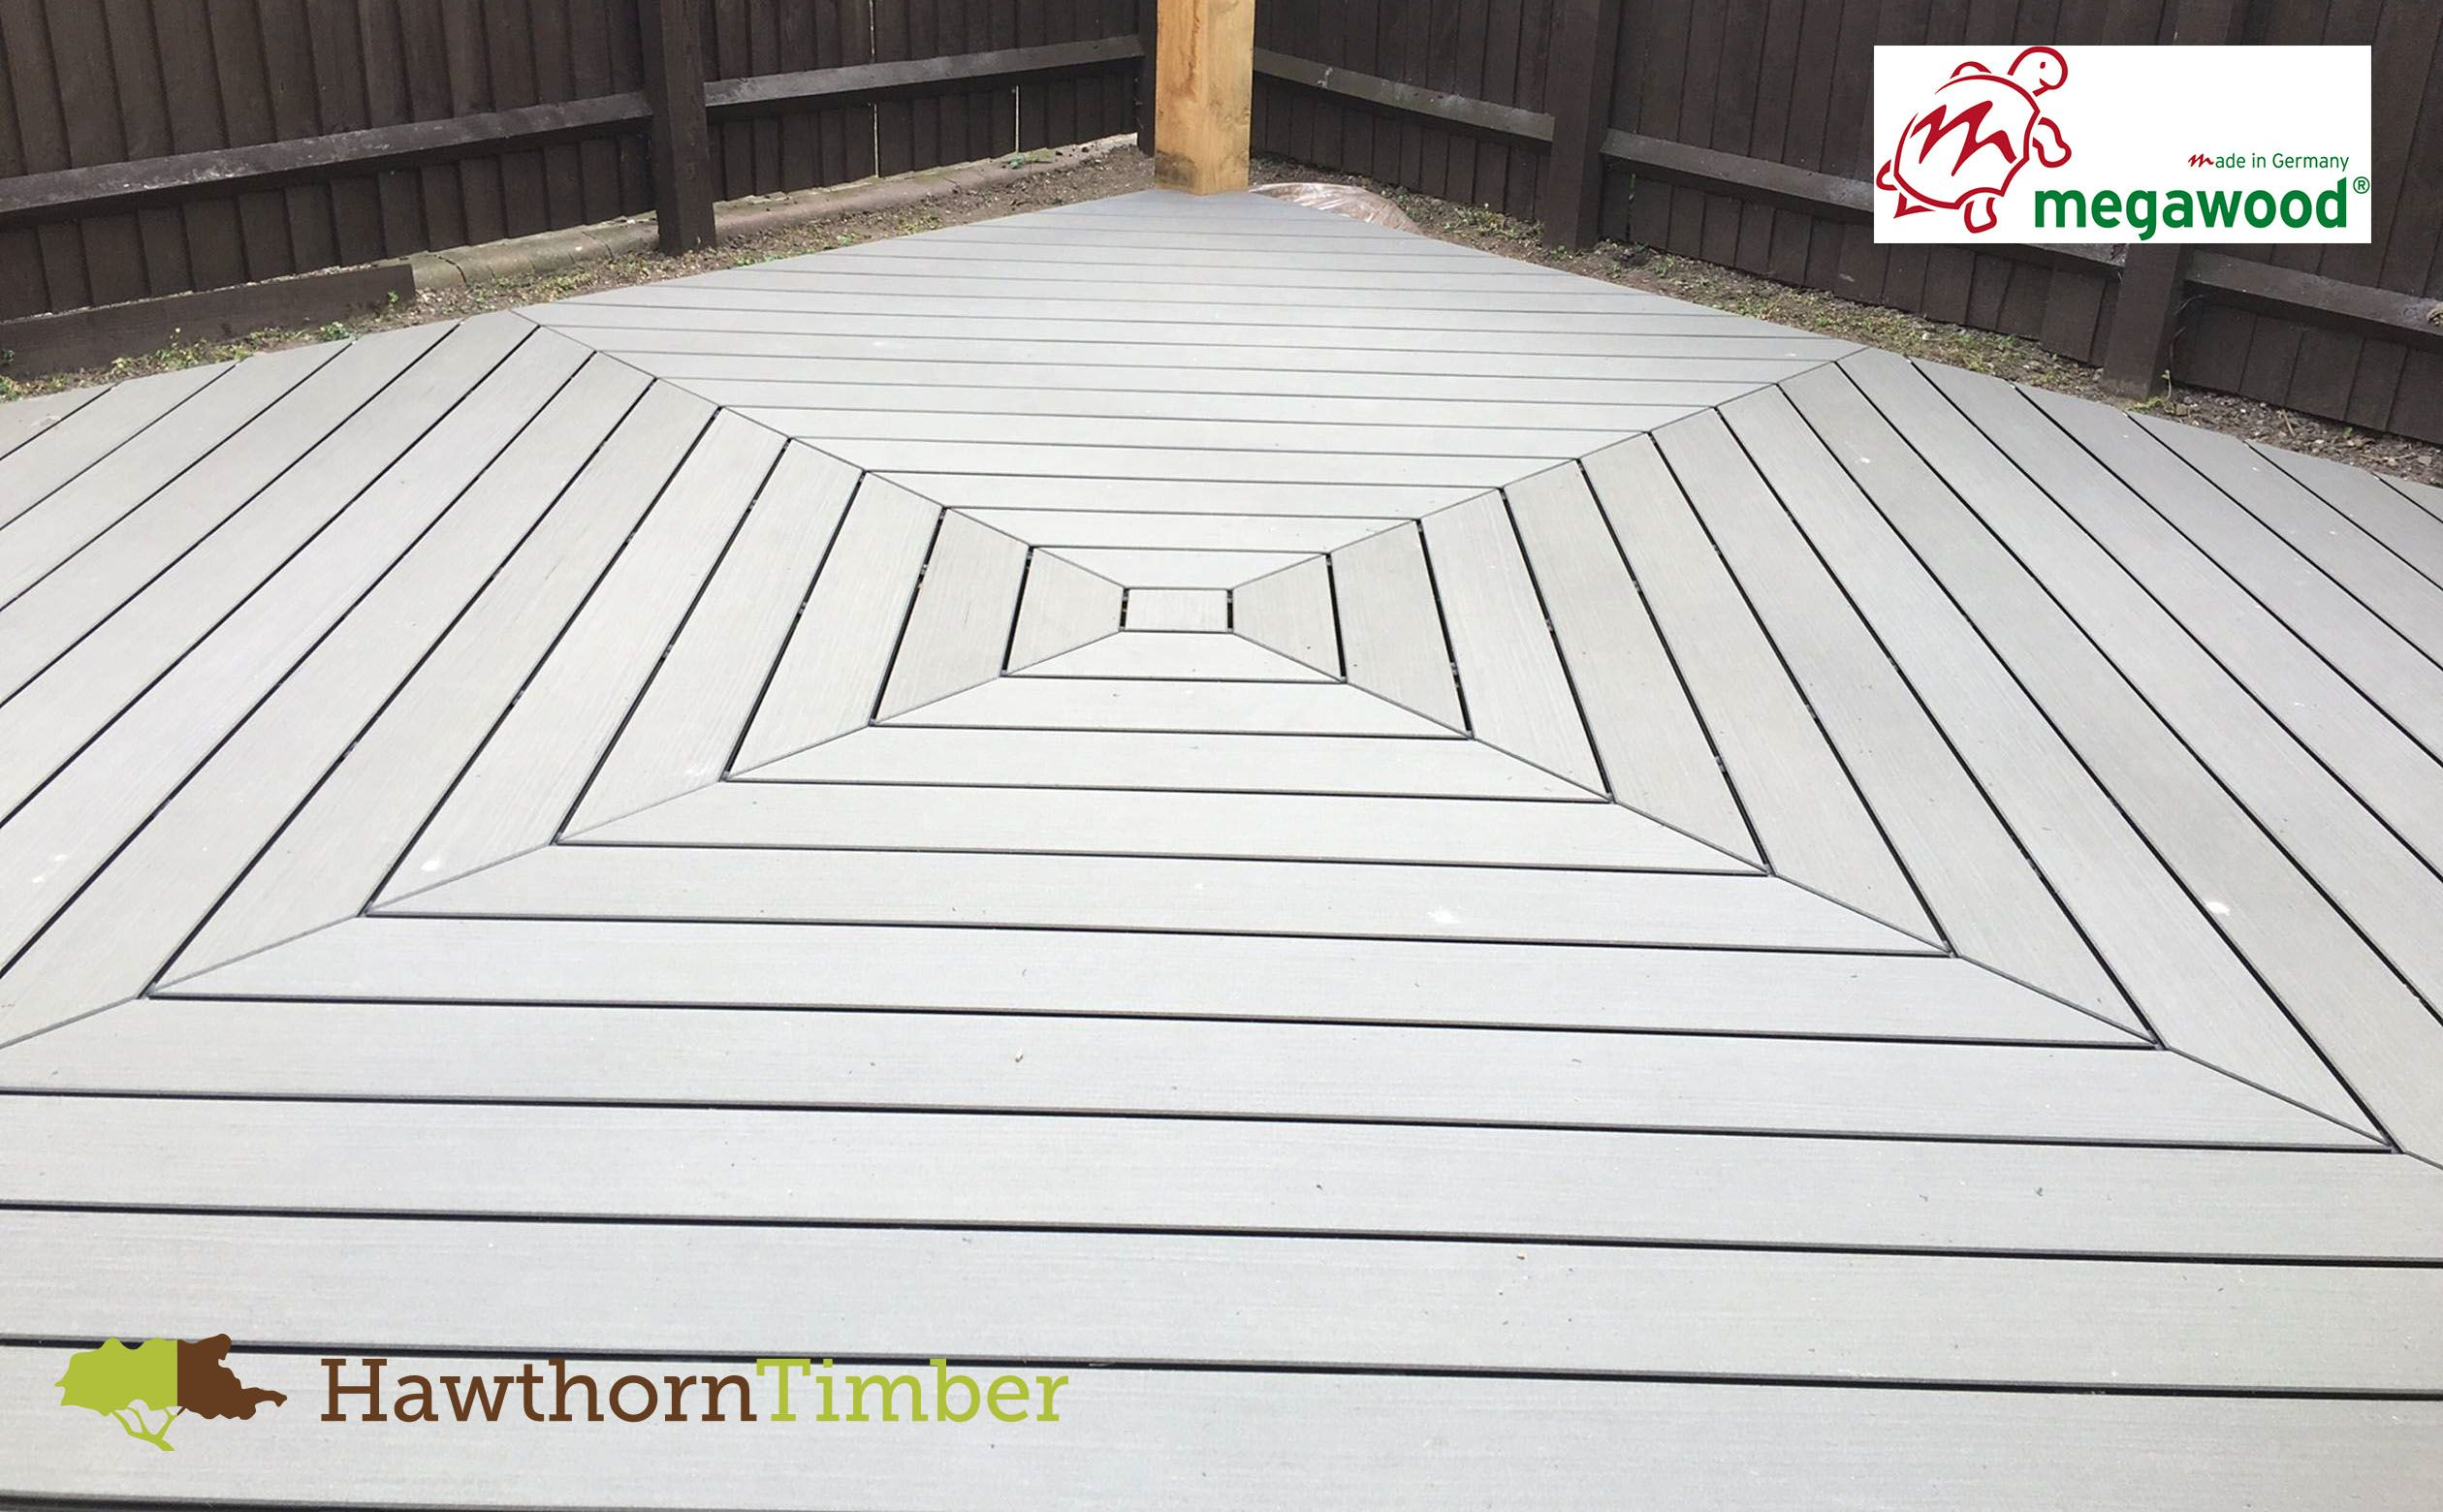 Wpc Dielen Megawood beautiful pattern premium plus slate grey megawood decking ask us